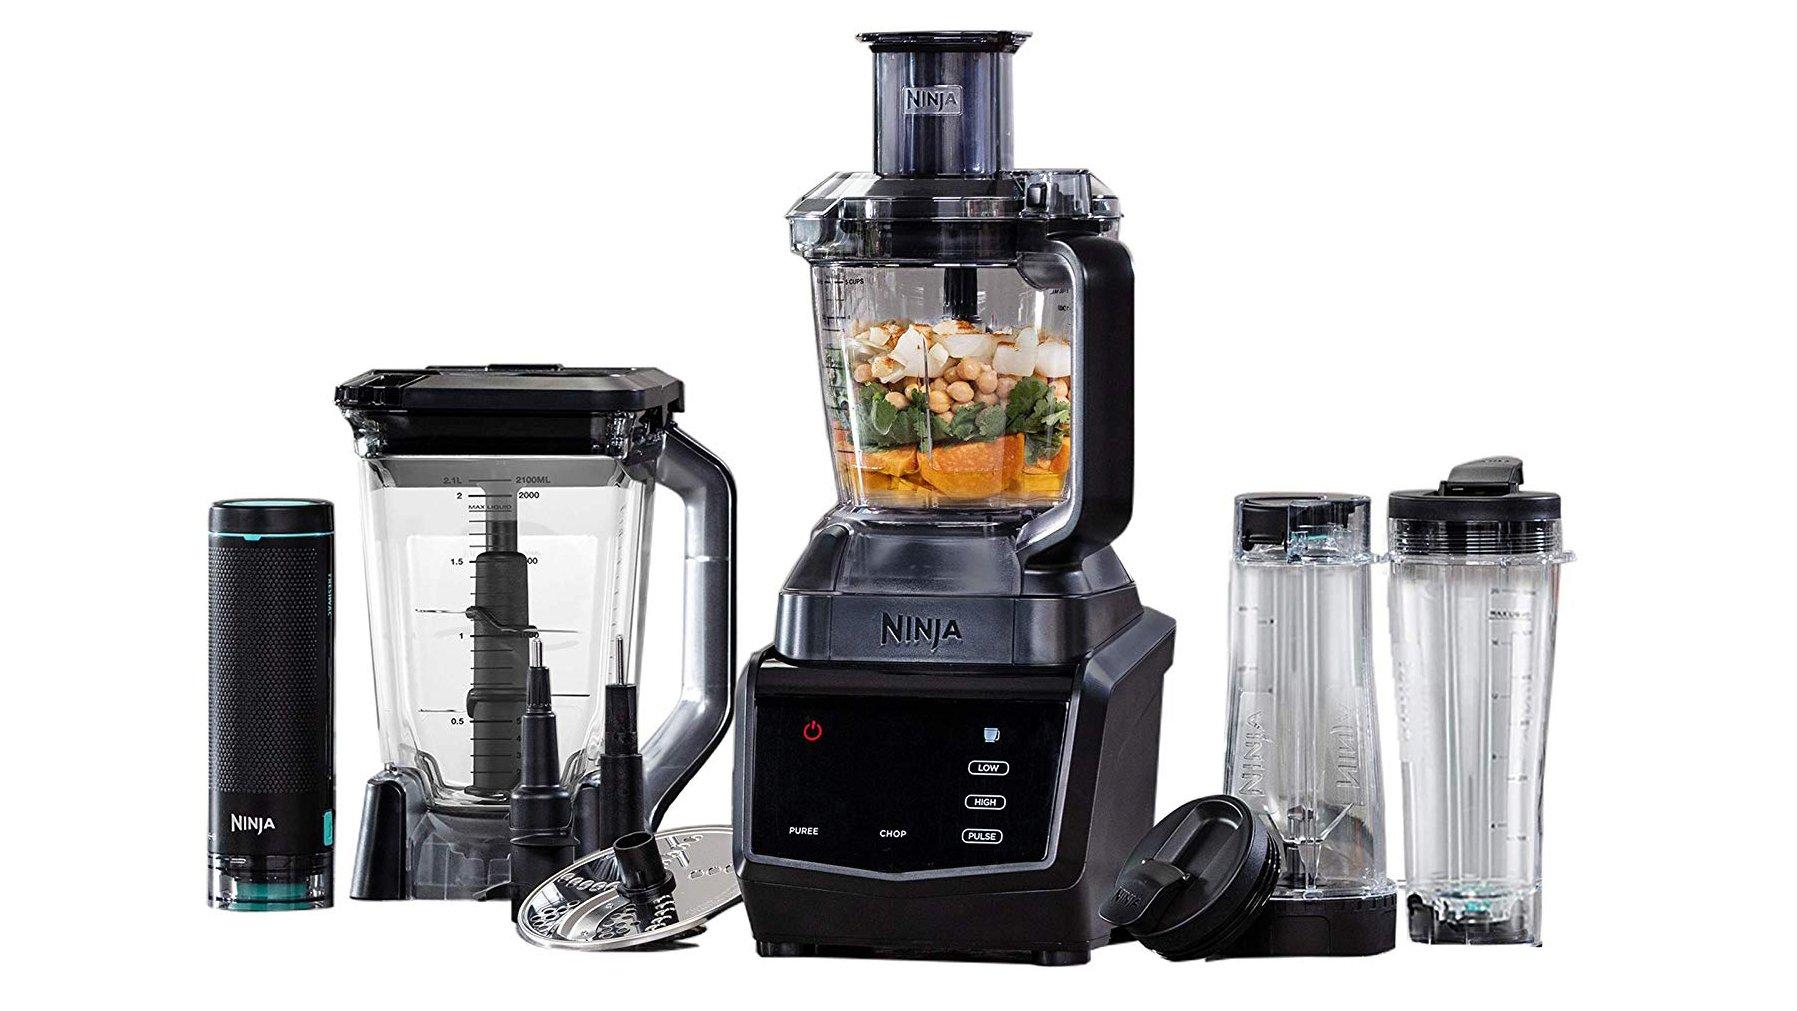 ninja blender smart screen with freshvac Best Coffee Maker For Home